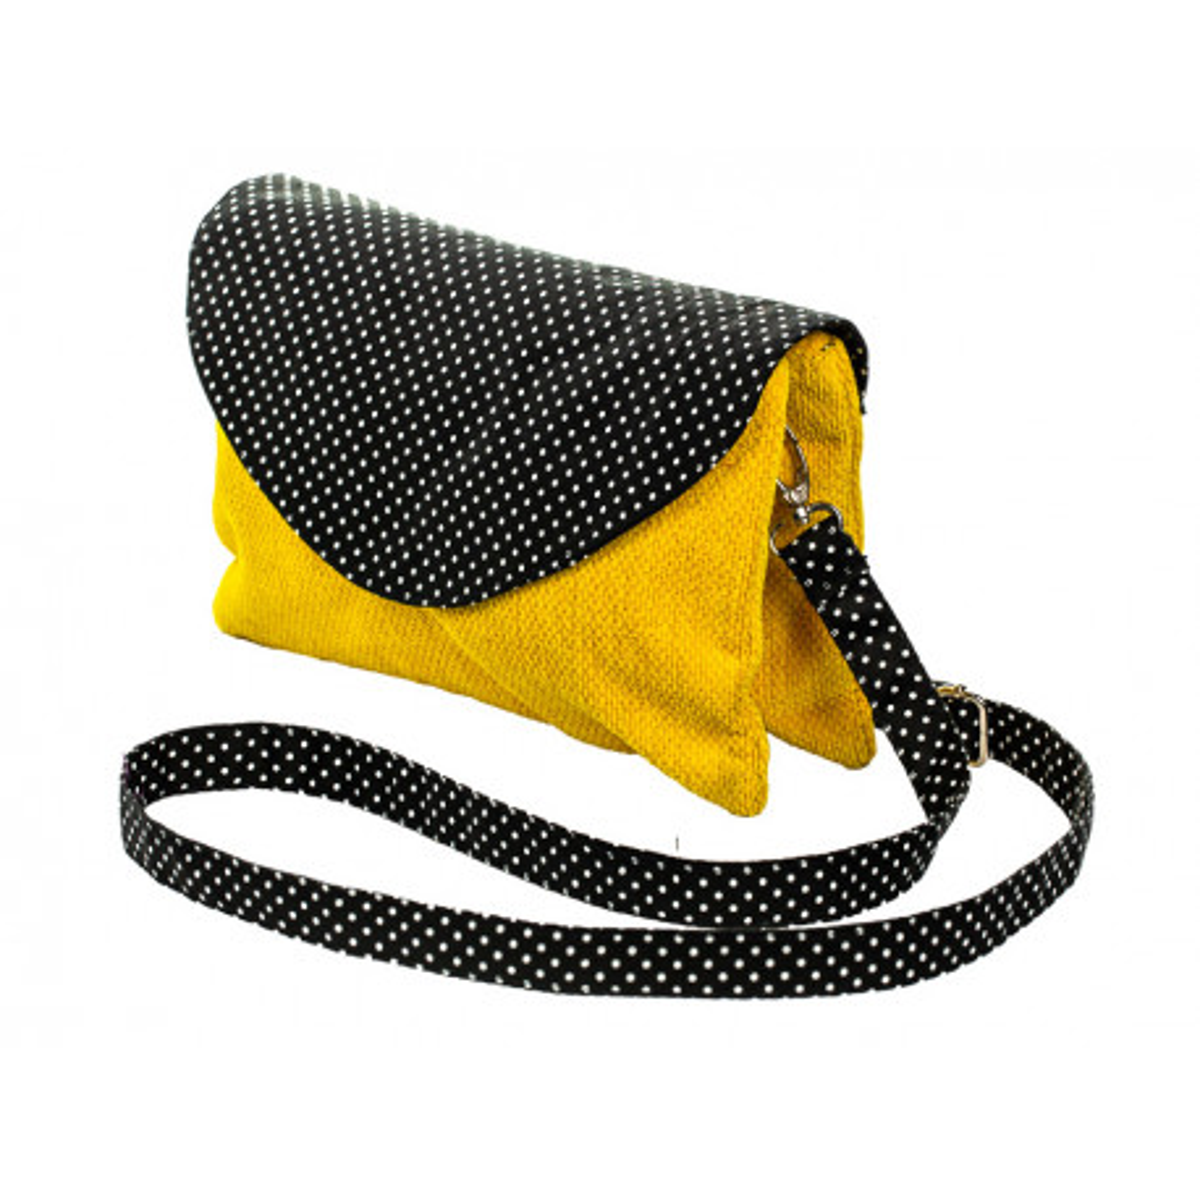 Sac double zip velours Black dots